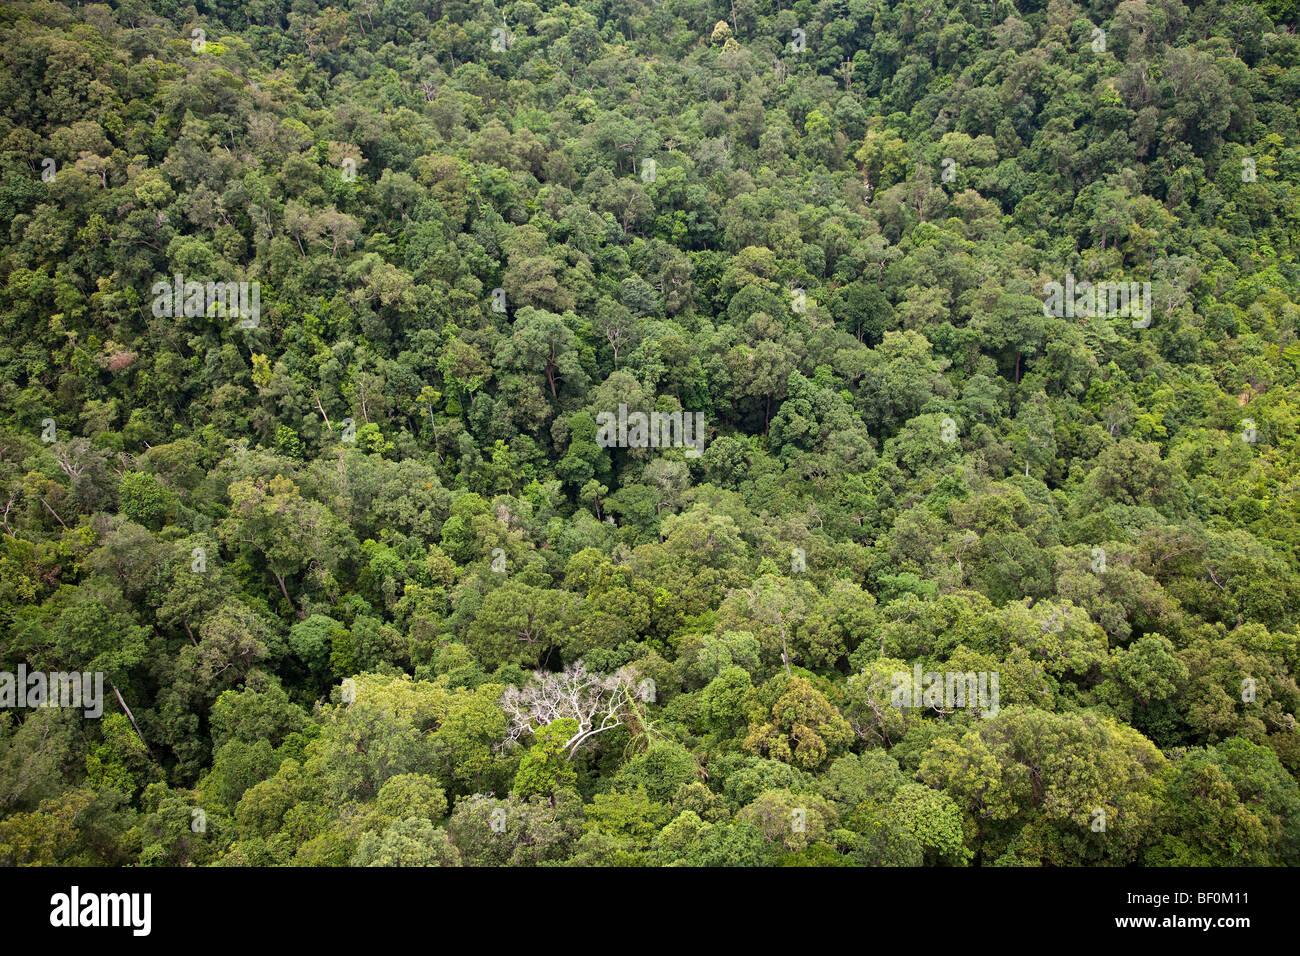 Vista aérea del dosel del bosque secundario, Malasia Imagen De Stock